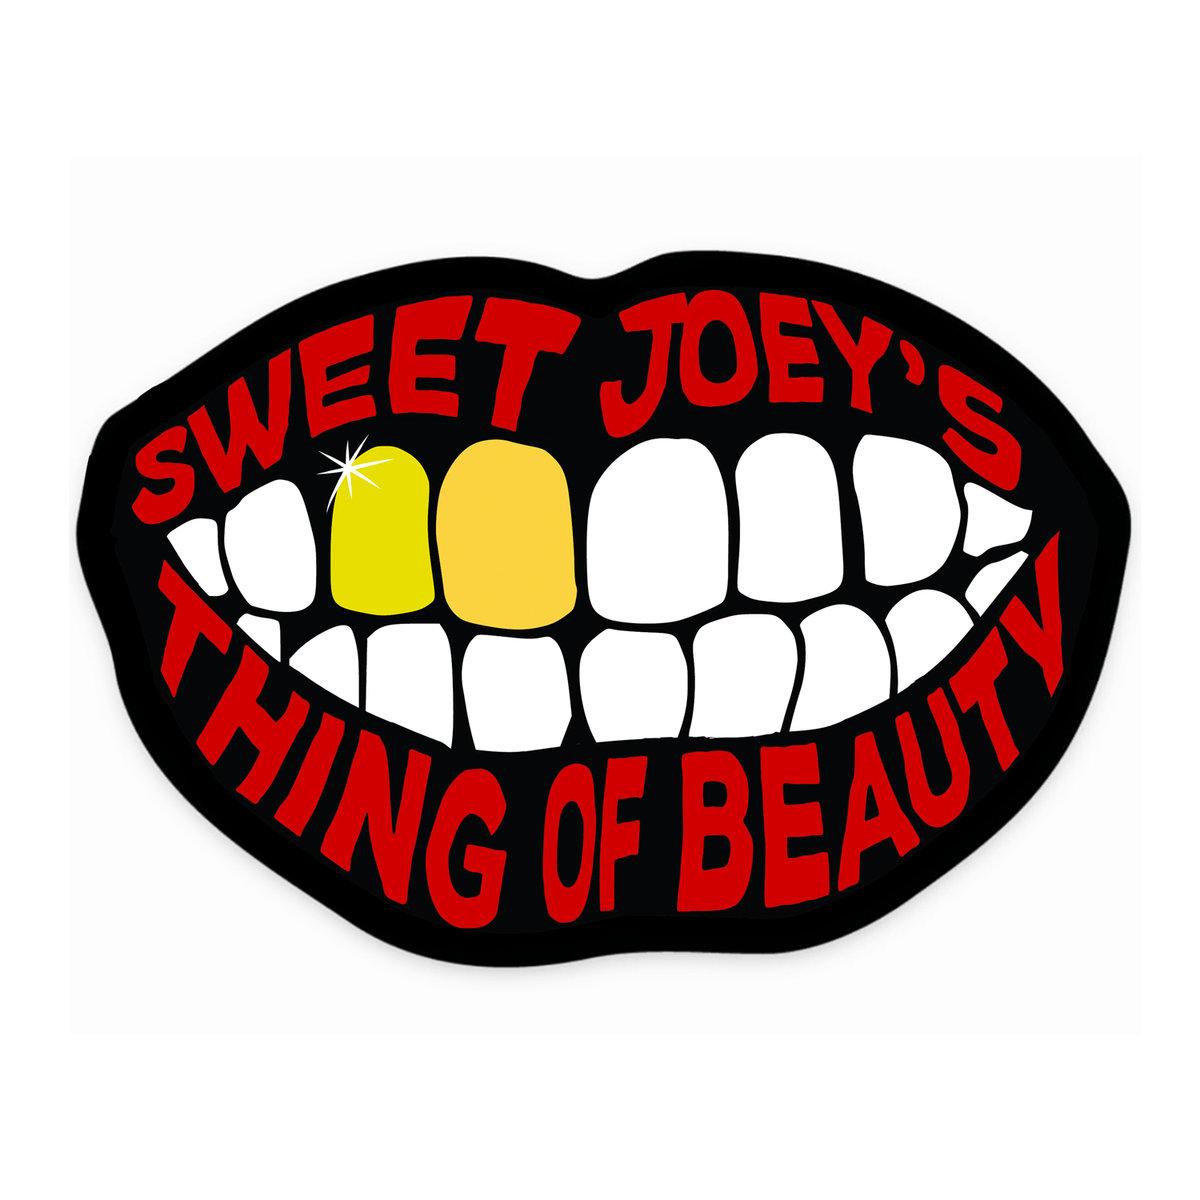 12/21 Sweet Joeys Thing of Beauty with DJ Sleepy Williams